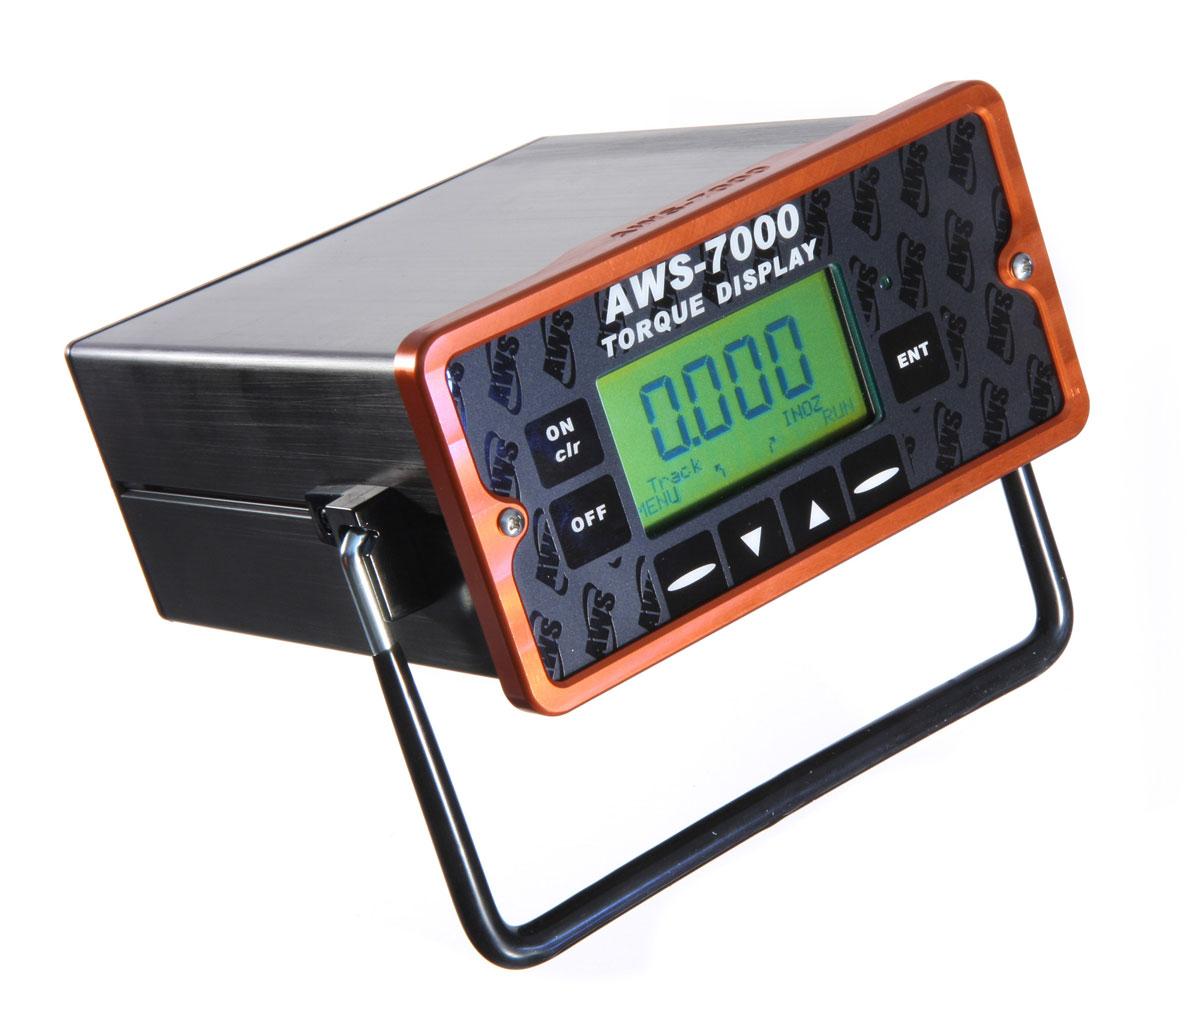 aws-7000 torque display